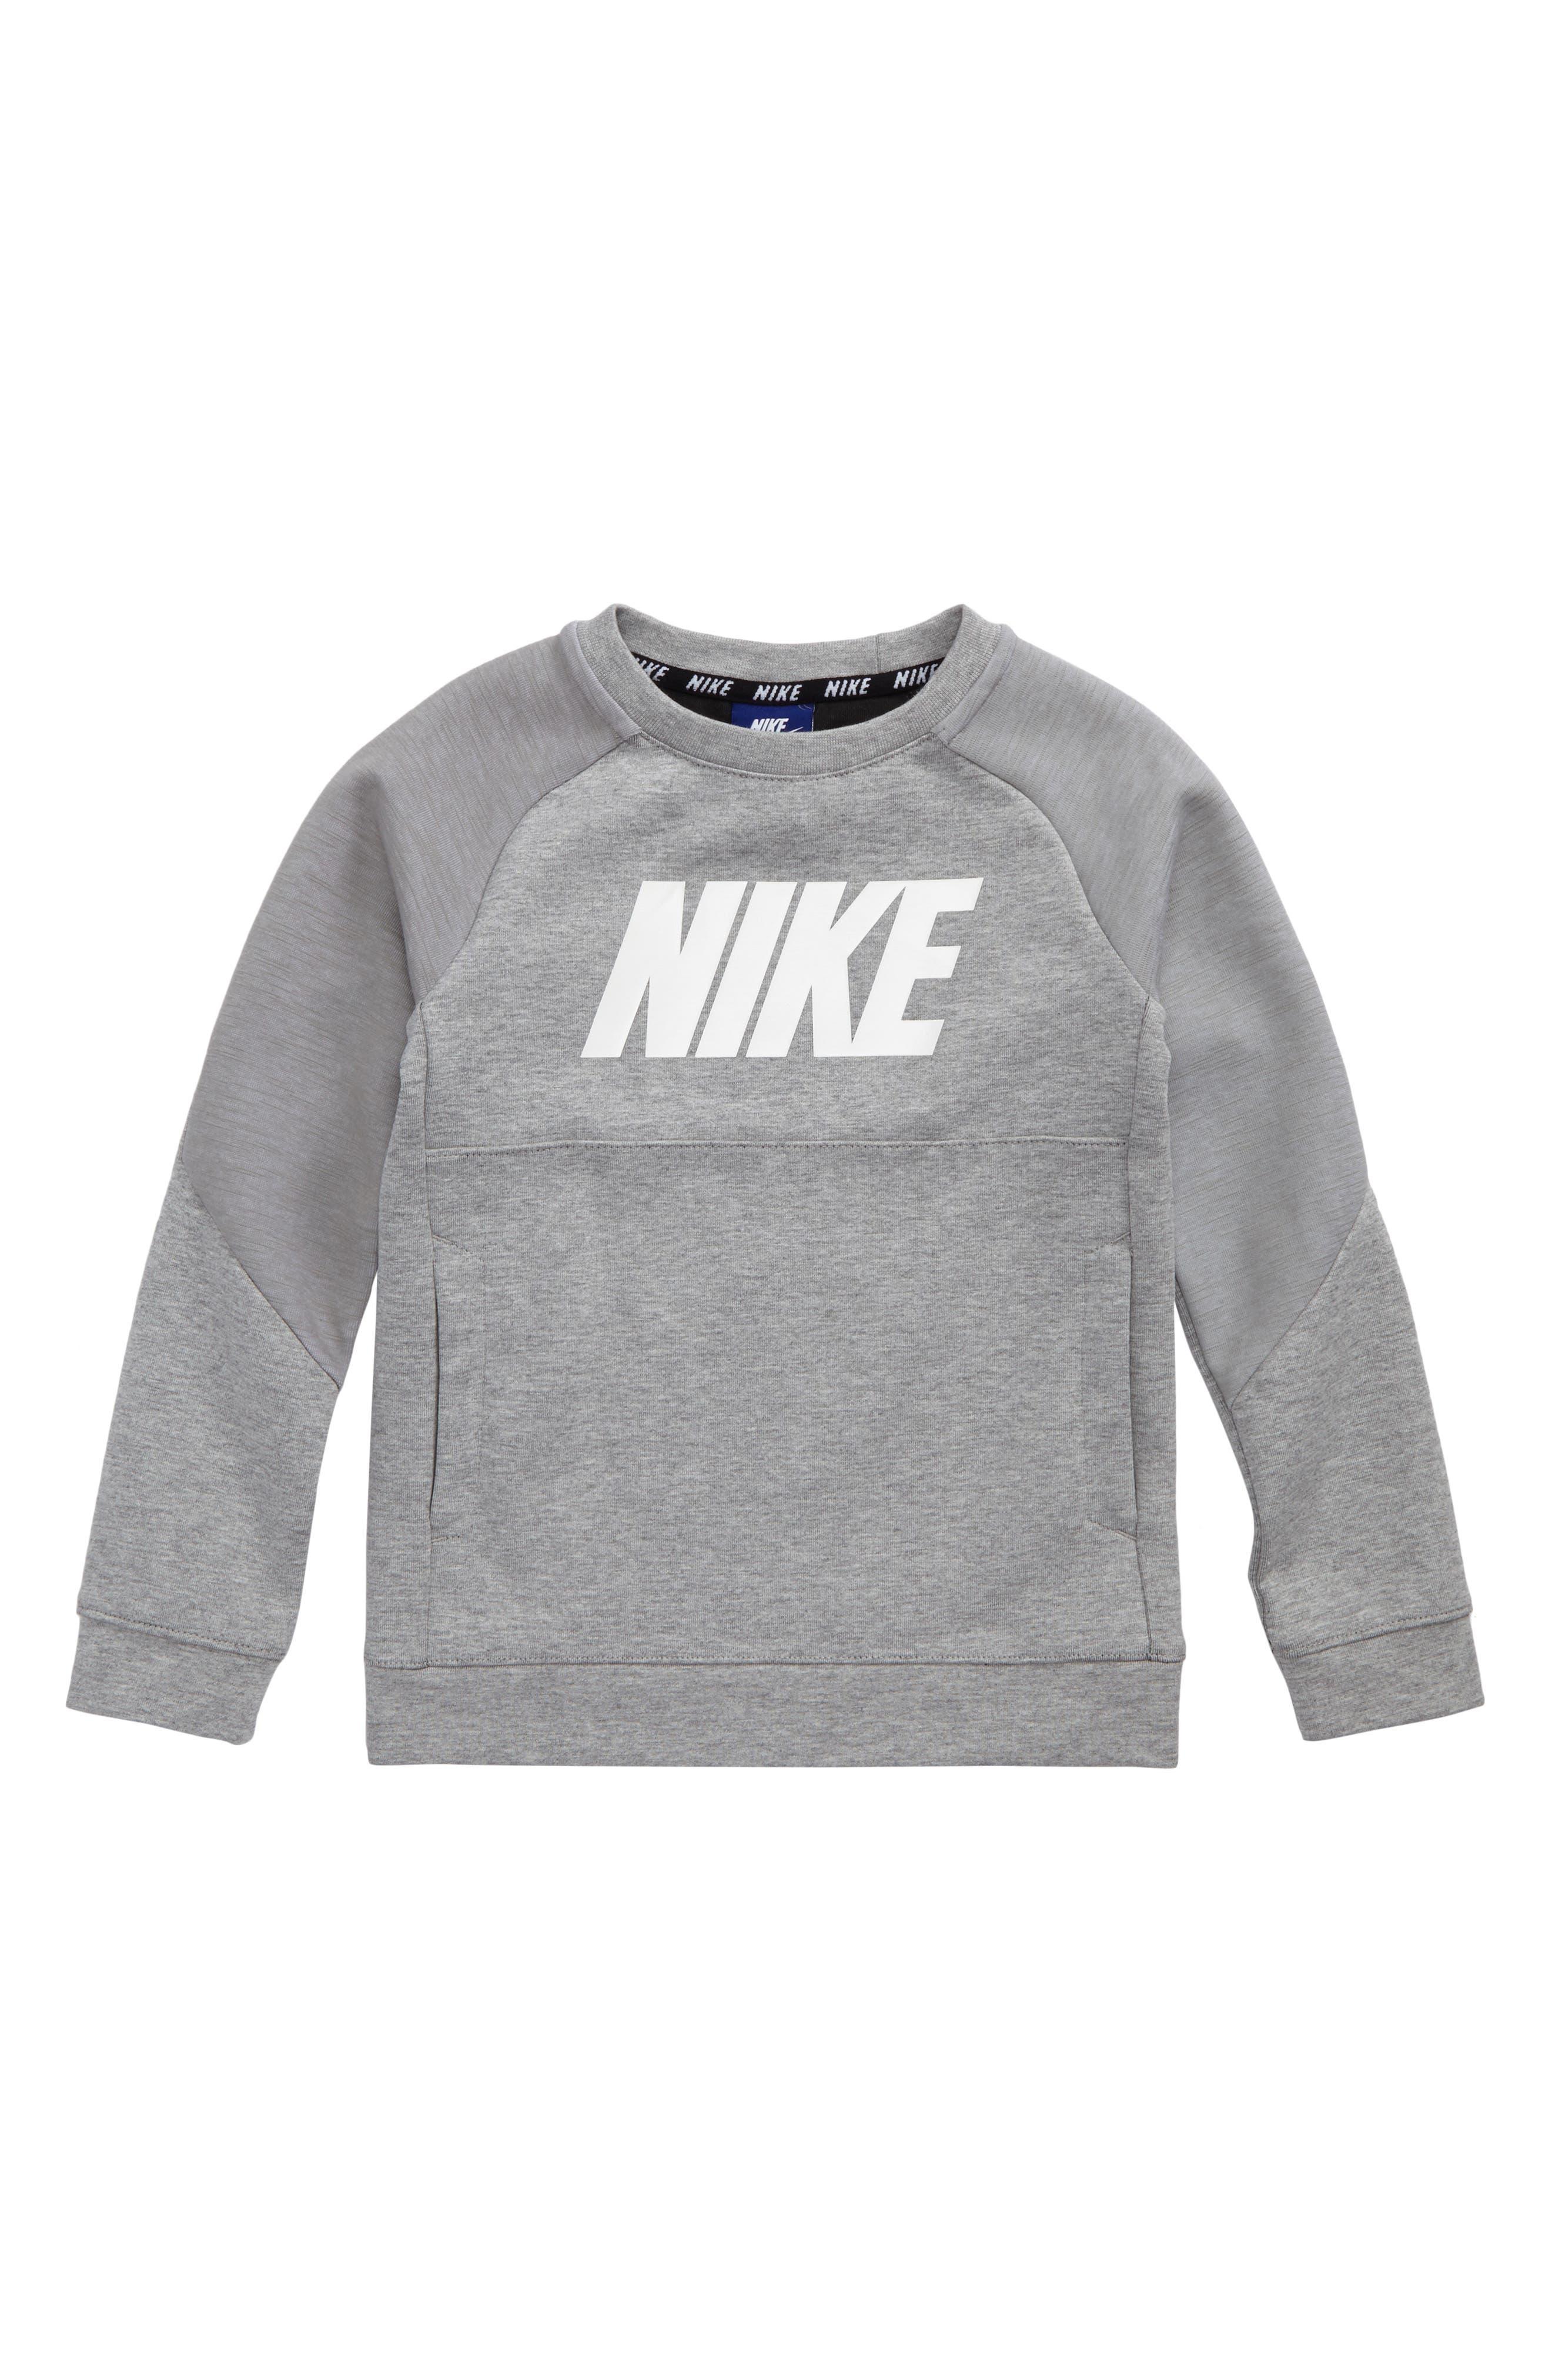 Alternate Image 1 Selected - Nike Raglan Sleeve Sweatshirt (Toddler Boys & Little Boys)